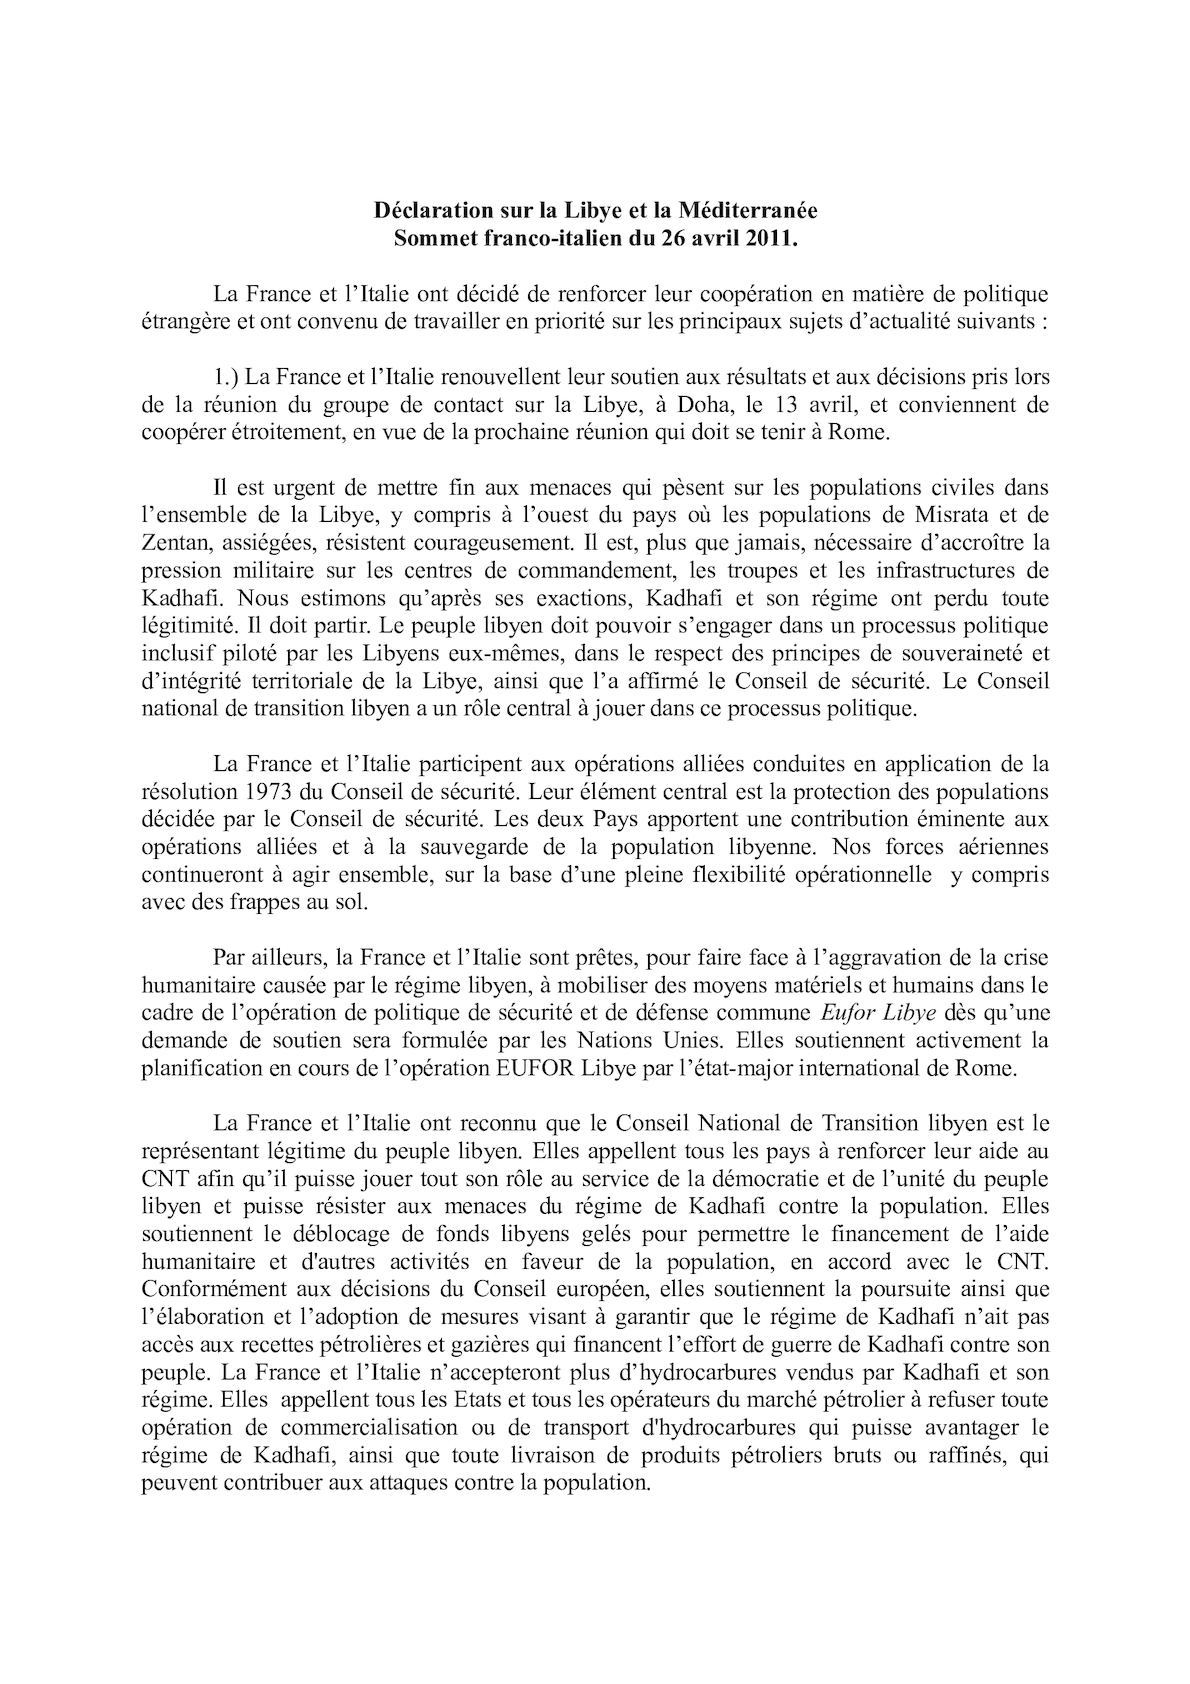 Déclaration Libye Méditerranée